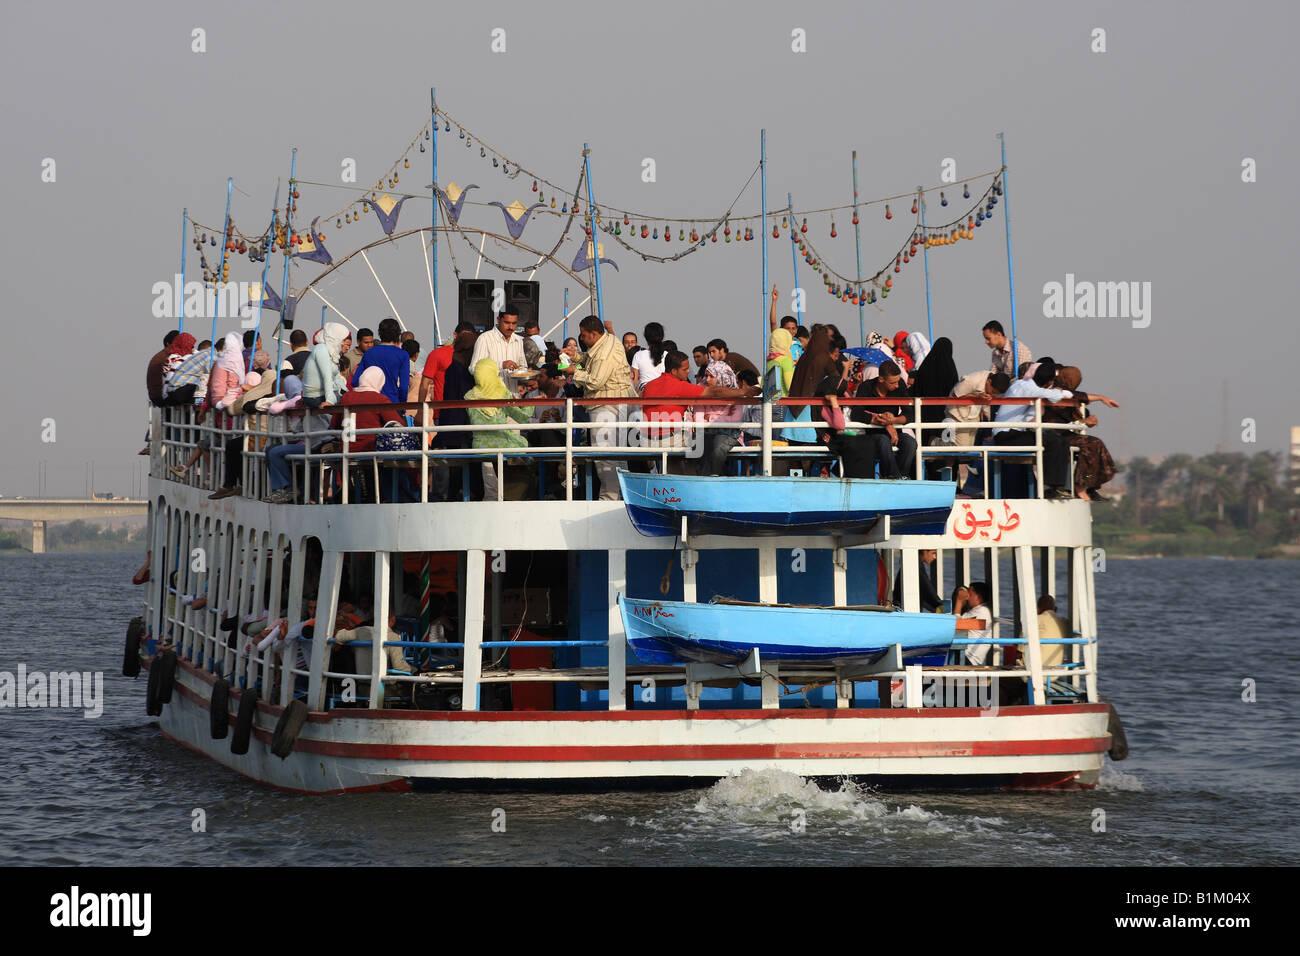 Junge ägyptische ein Flussboot mieten und Partei abgeben. Nil Kreuzfahrt Ägypten Stockfoto